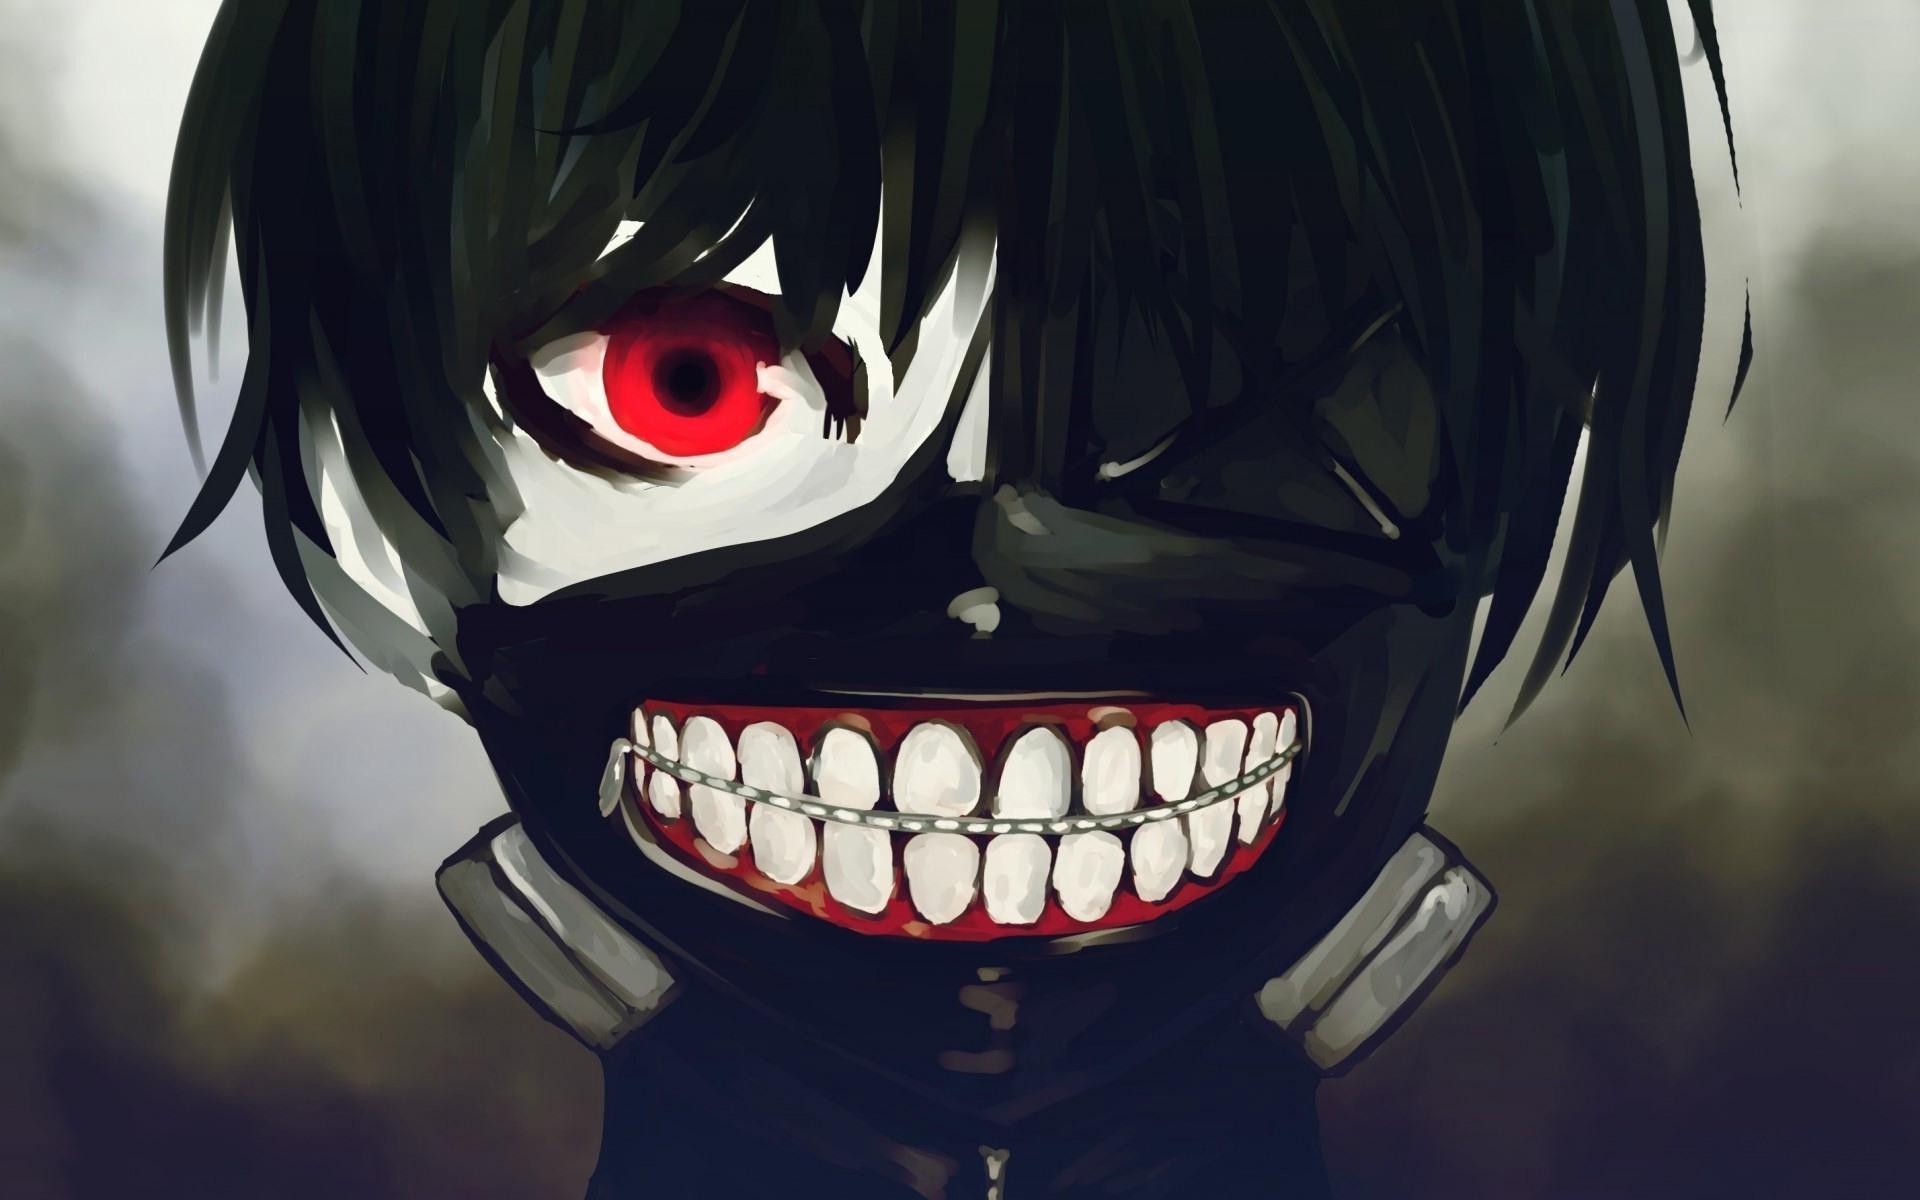 0 Awesome Anime Wallpaper 715x1024px 75.33 KB Anime Boy #333027